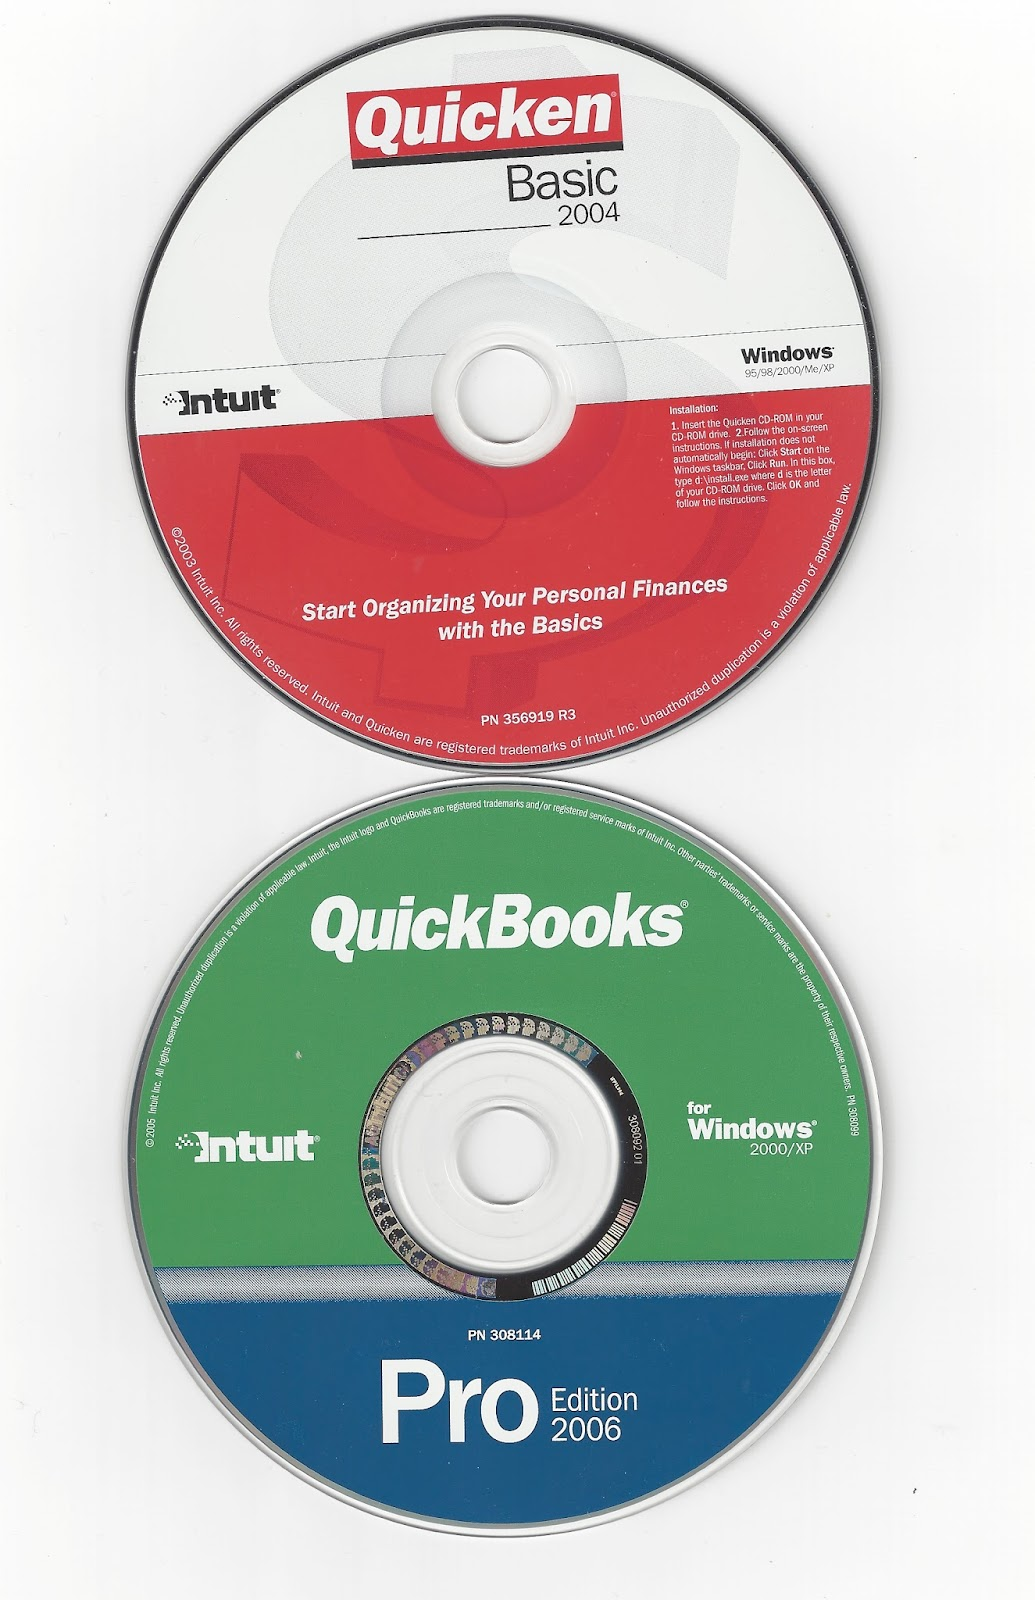 quicken 2004 basic download - neptunperks